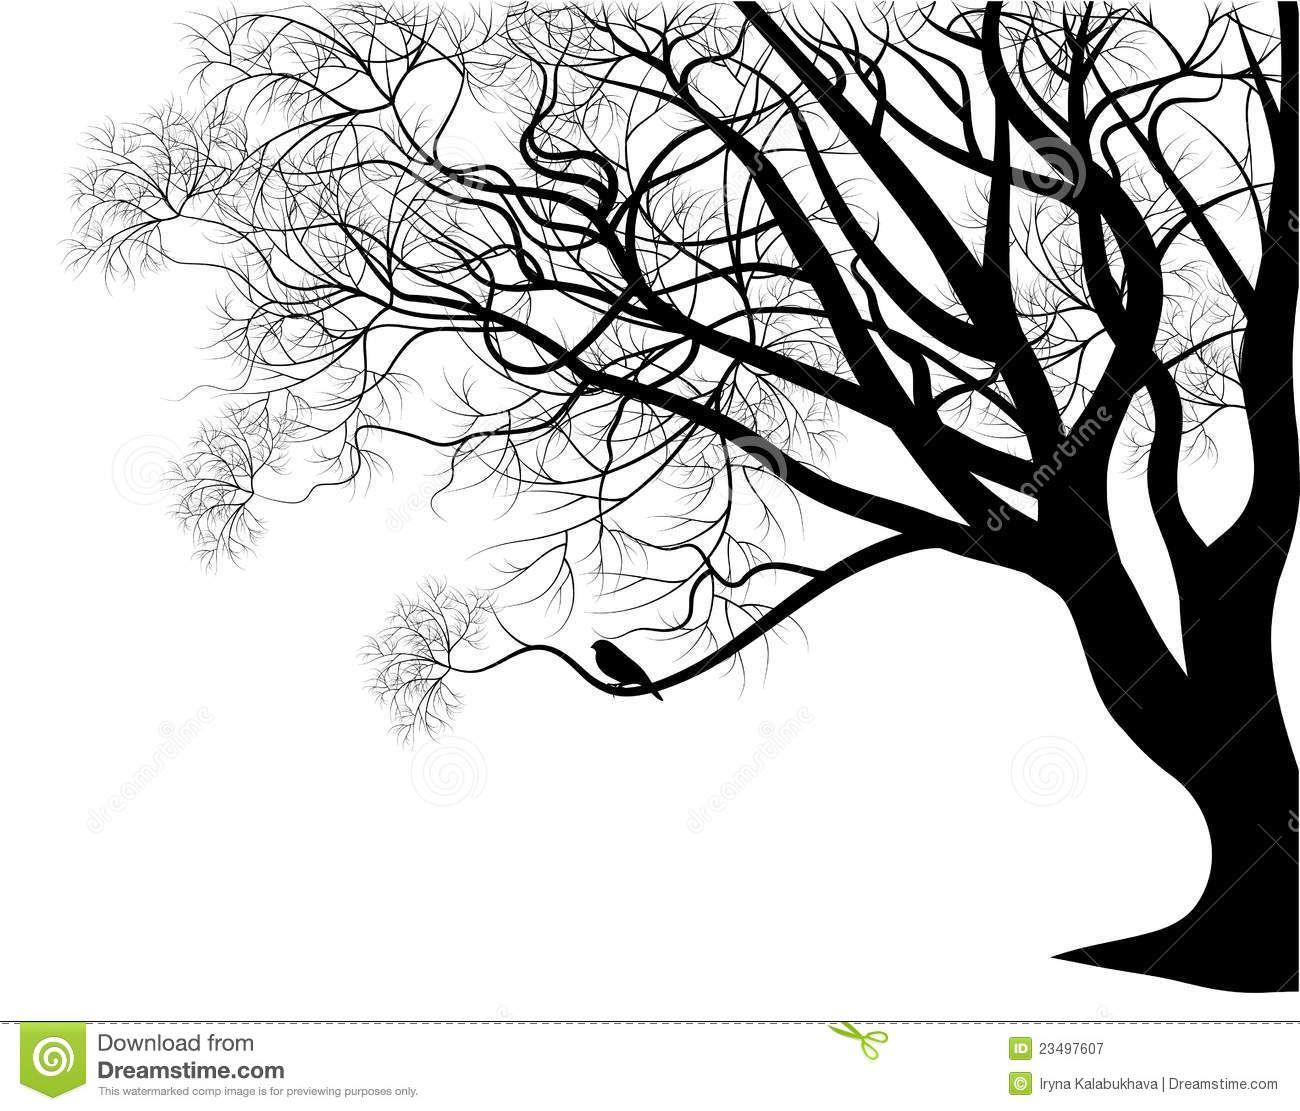 Tree branch with birds stencil bird on a tree branch ideas for tree branch with birds stencil bird on a tree branch amipublicfo Gallery